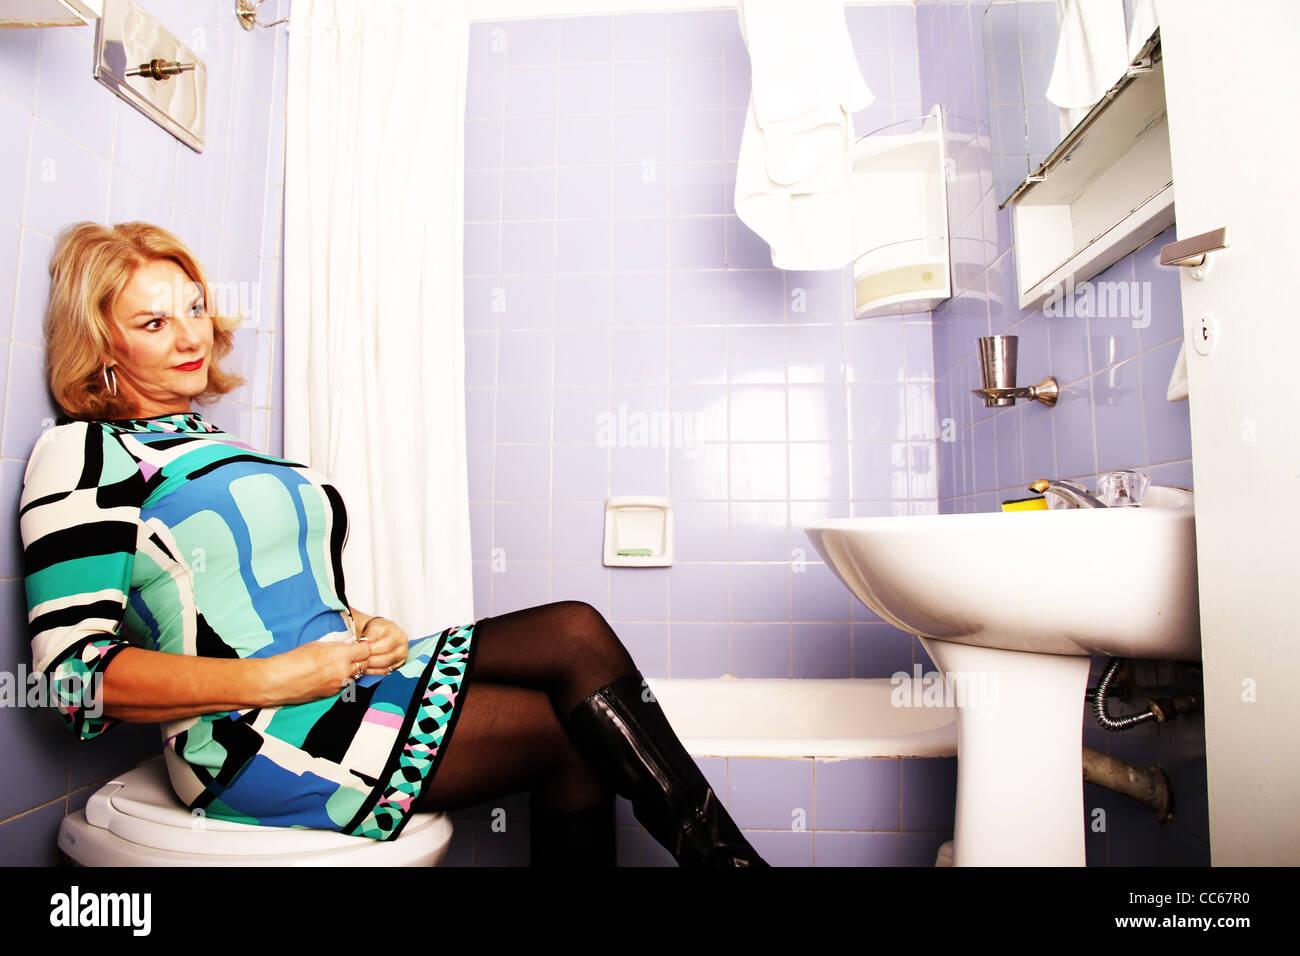 Jahrgang / Femme fatale / Retro Shoot. Frau auf der Toilette sitzend. Stockbild